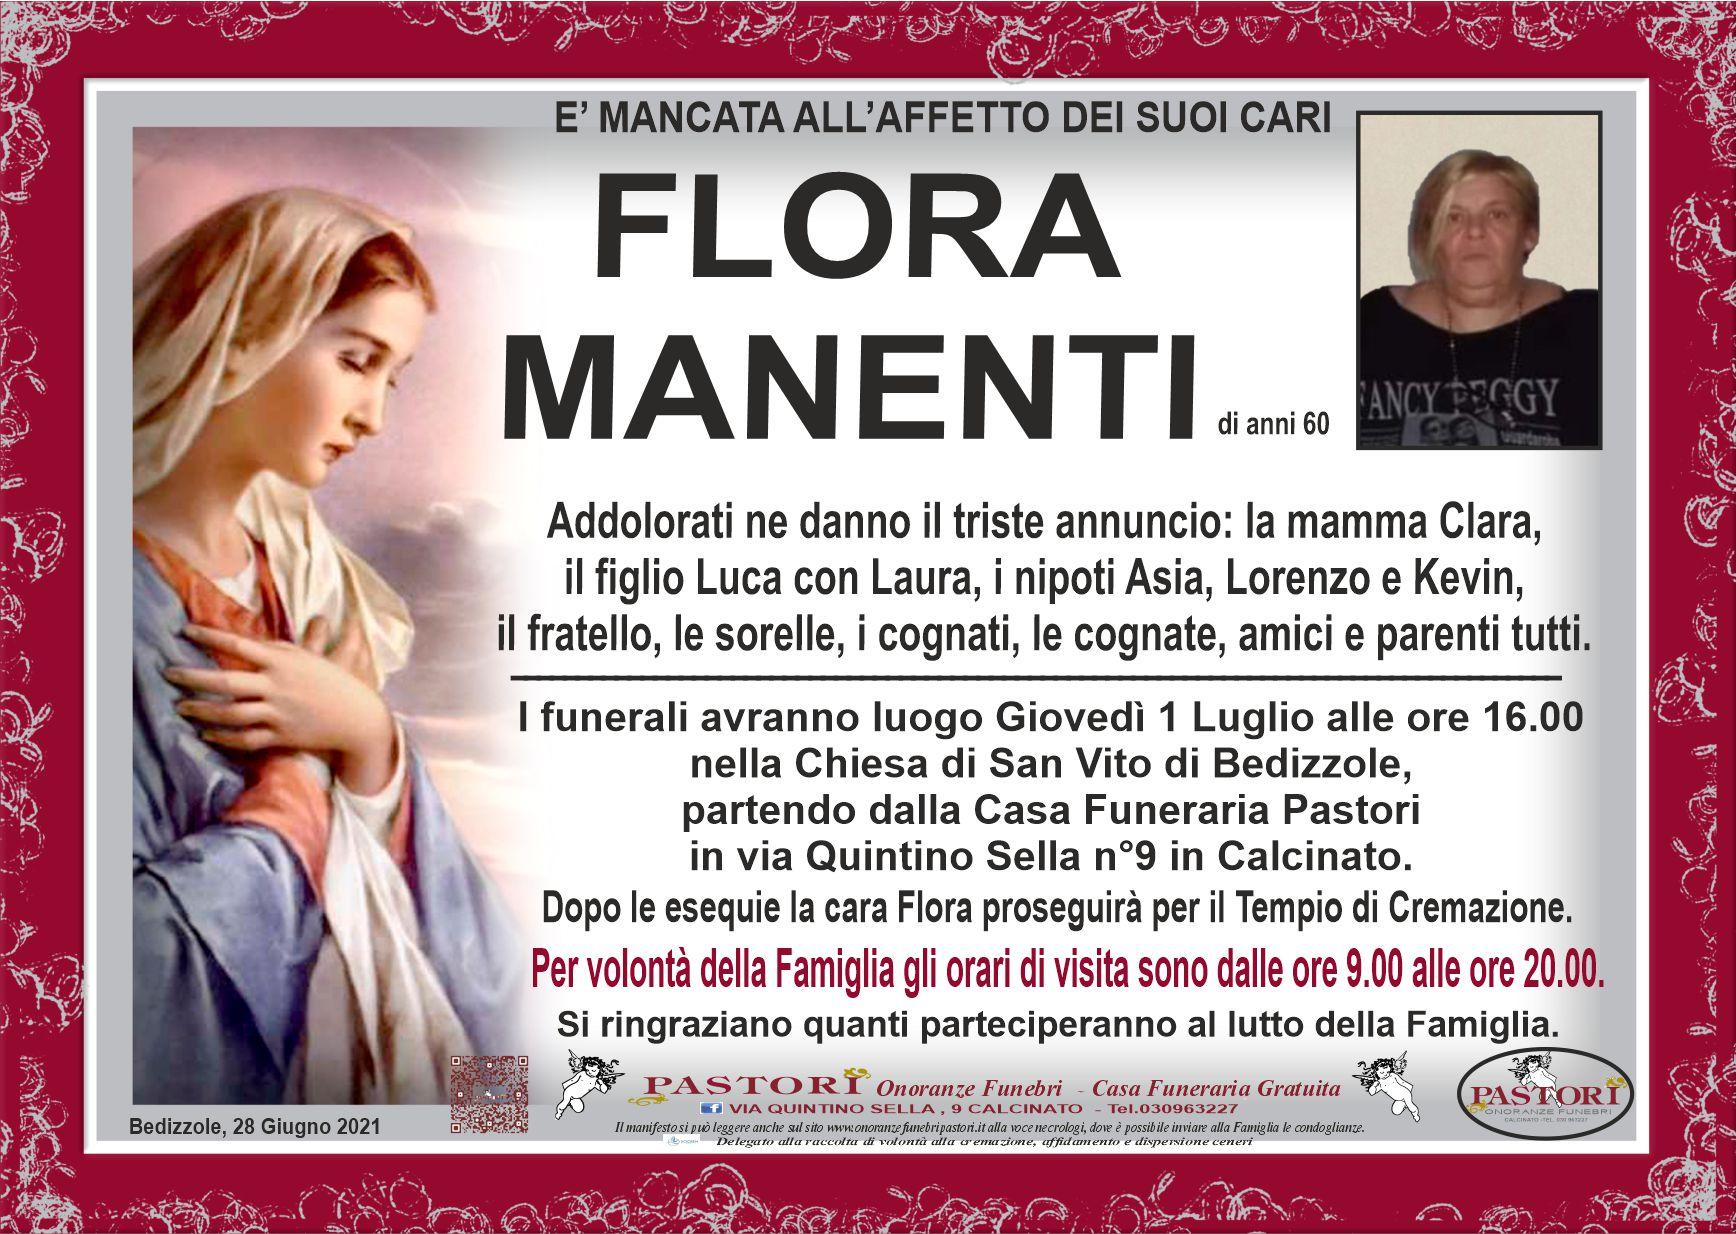 Flora Manenti